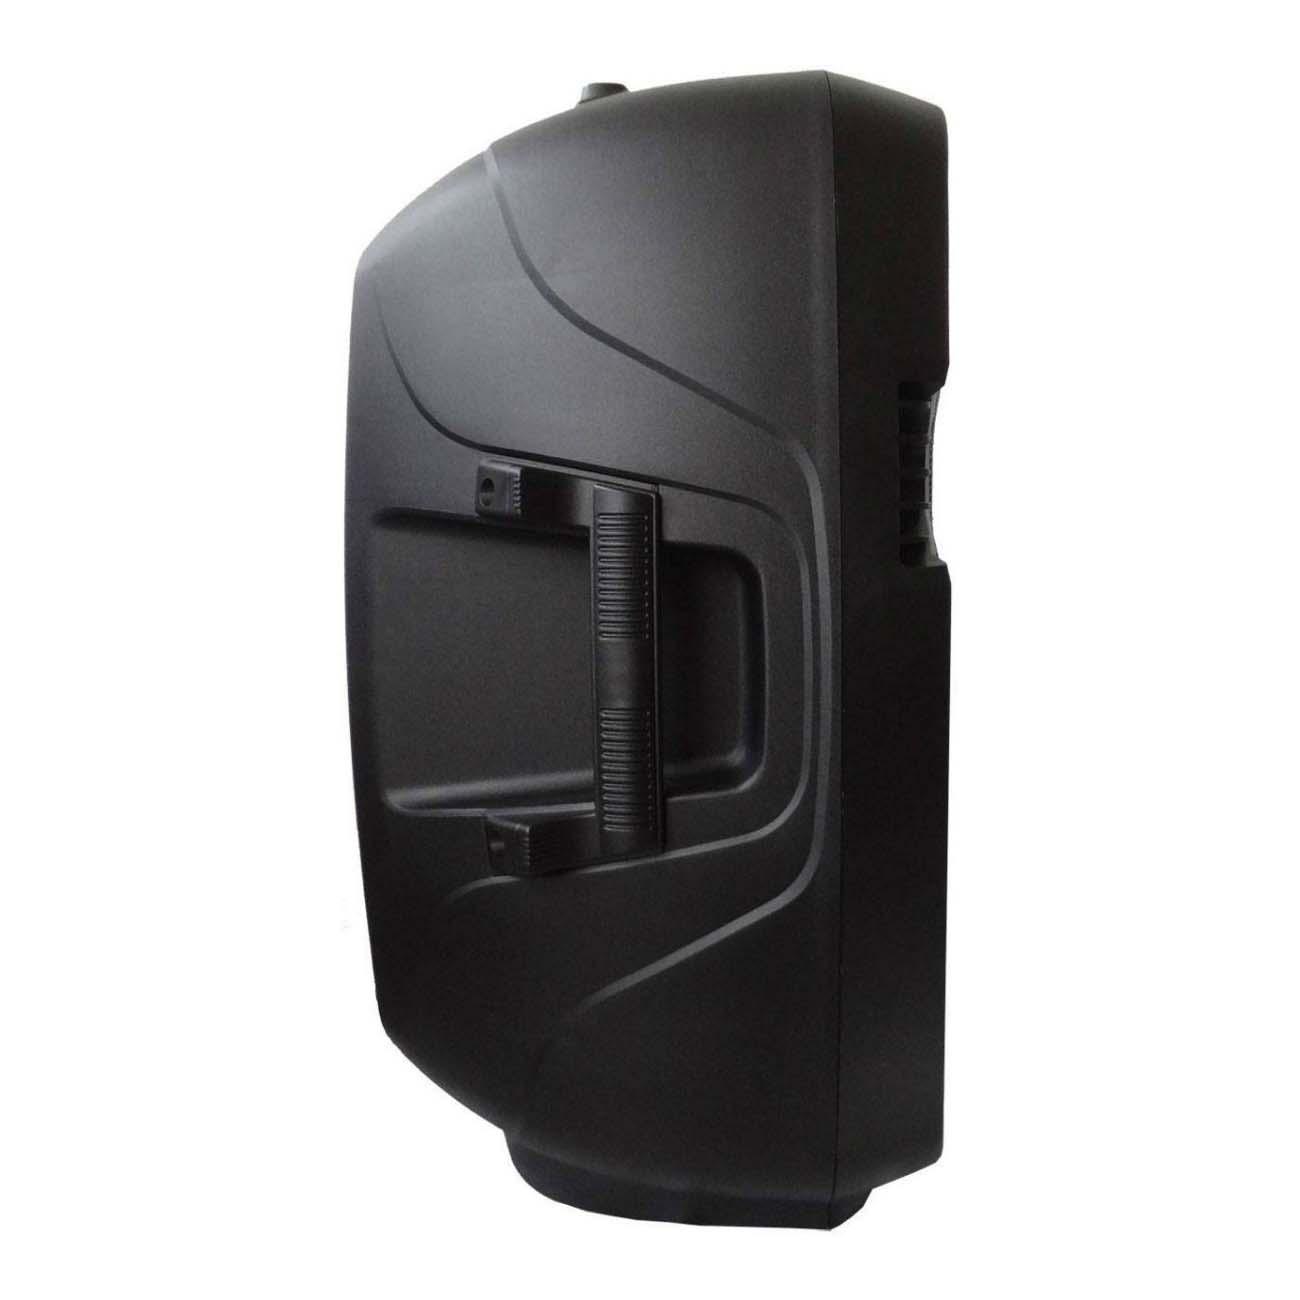 Caixa Acústica Passiva WLS J12 Pro